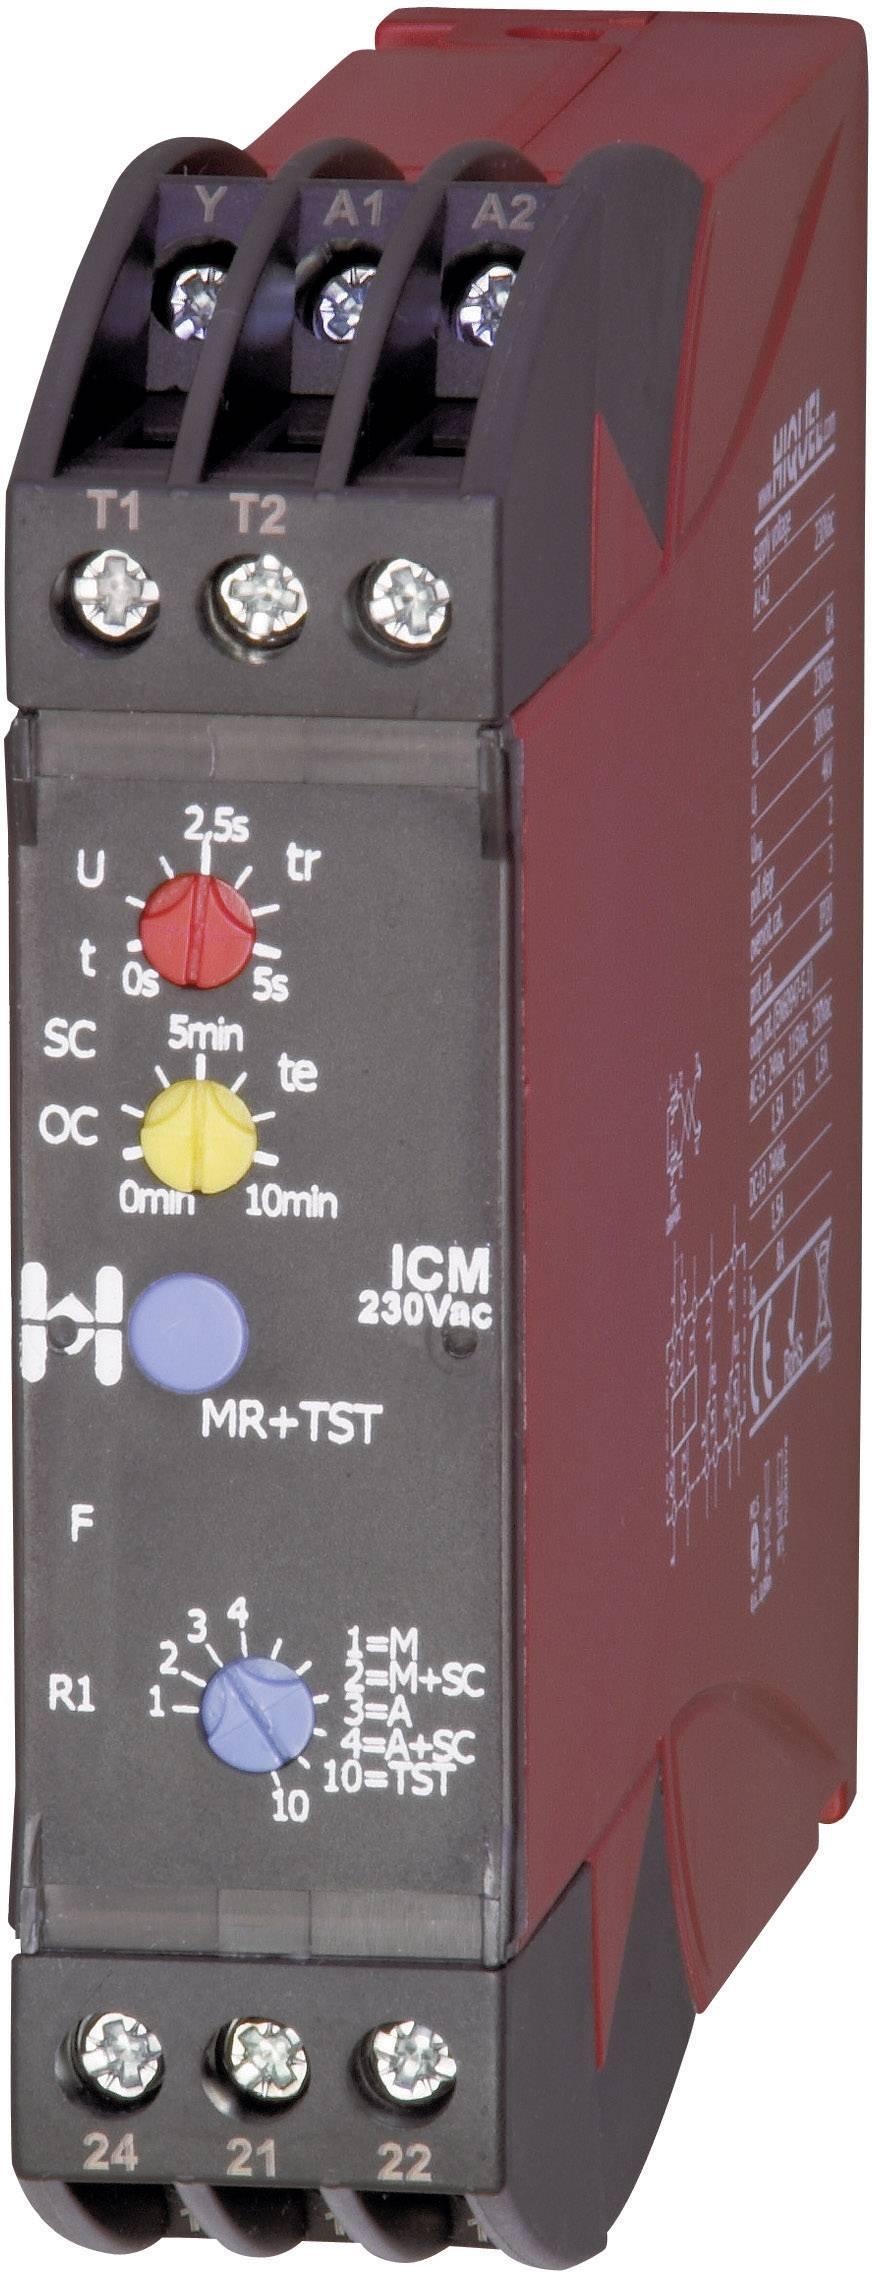 Hiquel ICM 230Vac ICM 230Vac